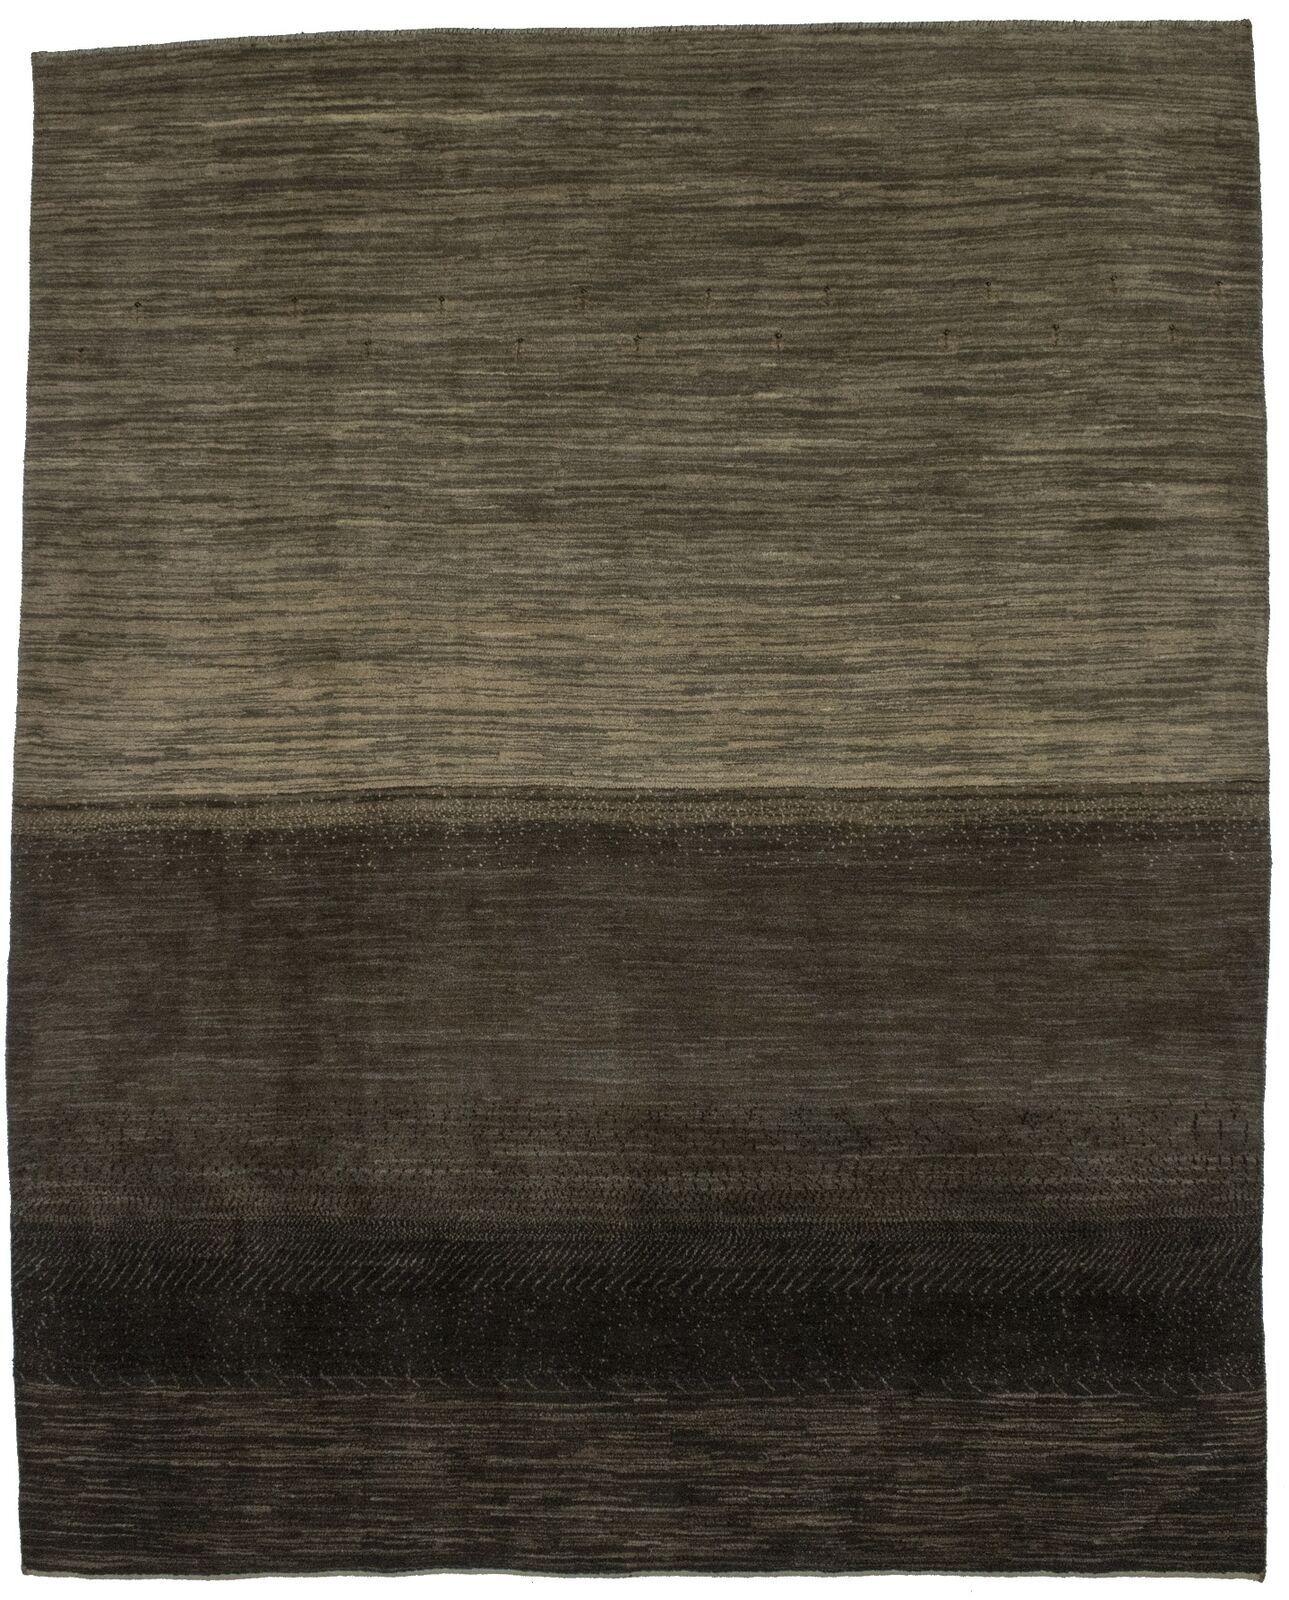 Modern Gabbeh Handmade 7x9 Contemporary Area Rug Oriental Decor